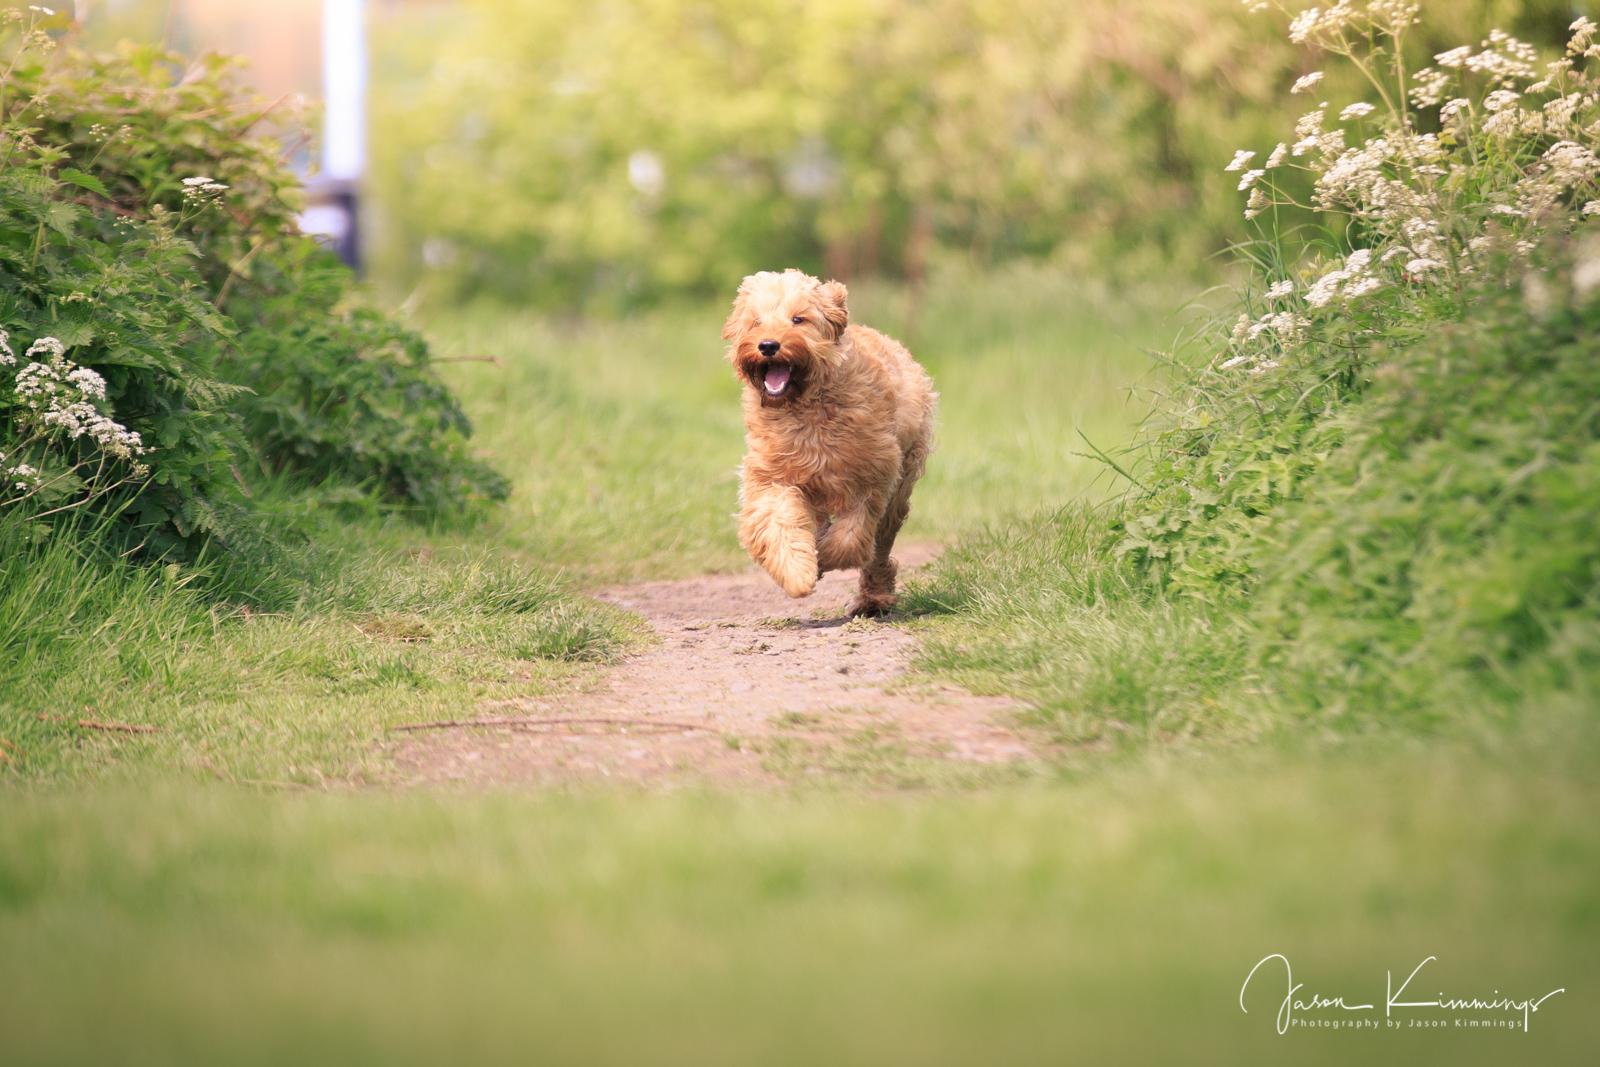 Dog-pet-photography-edinburgh-glasgow-west-lothian-1.jpg